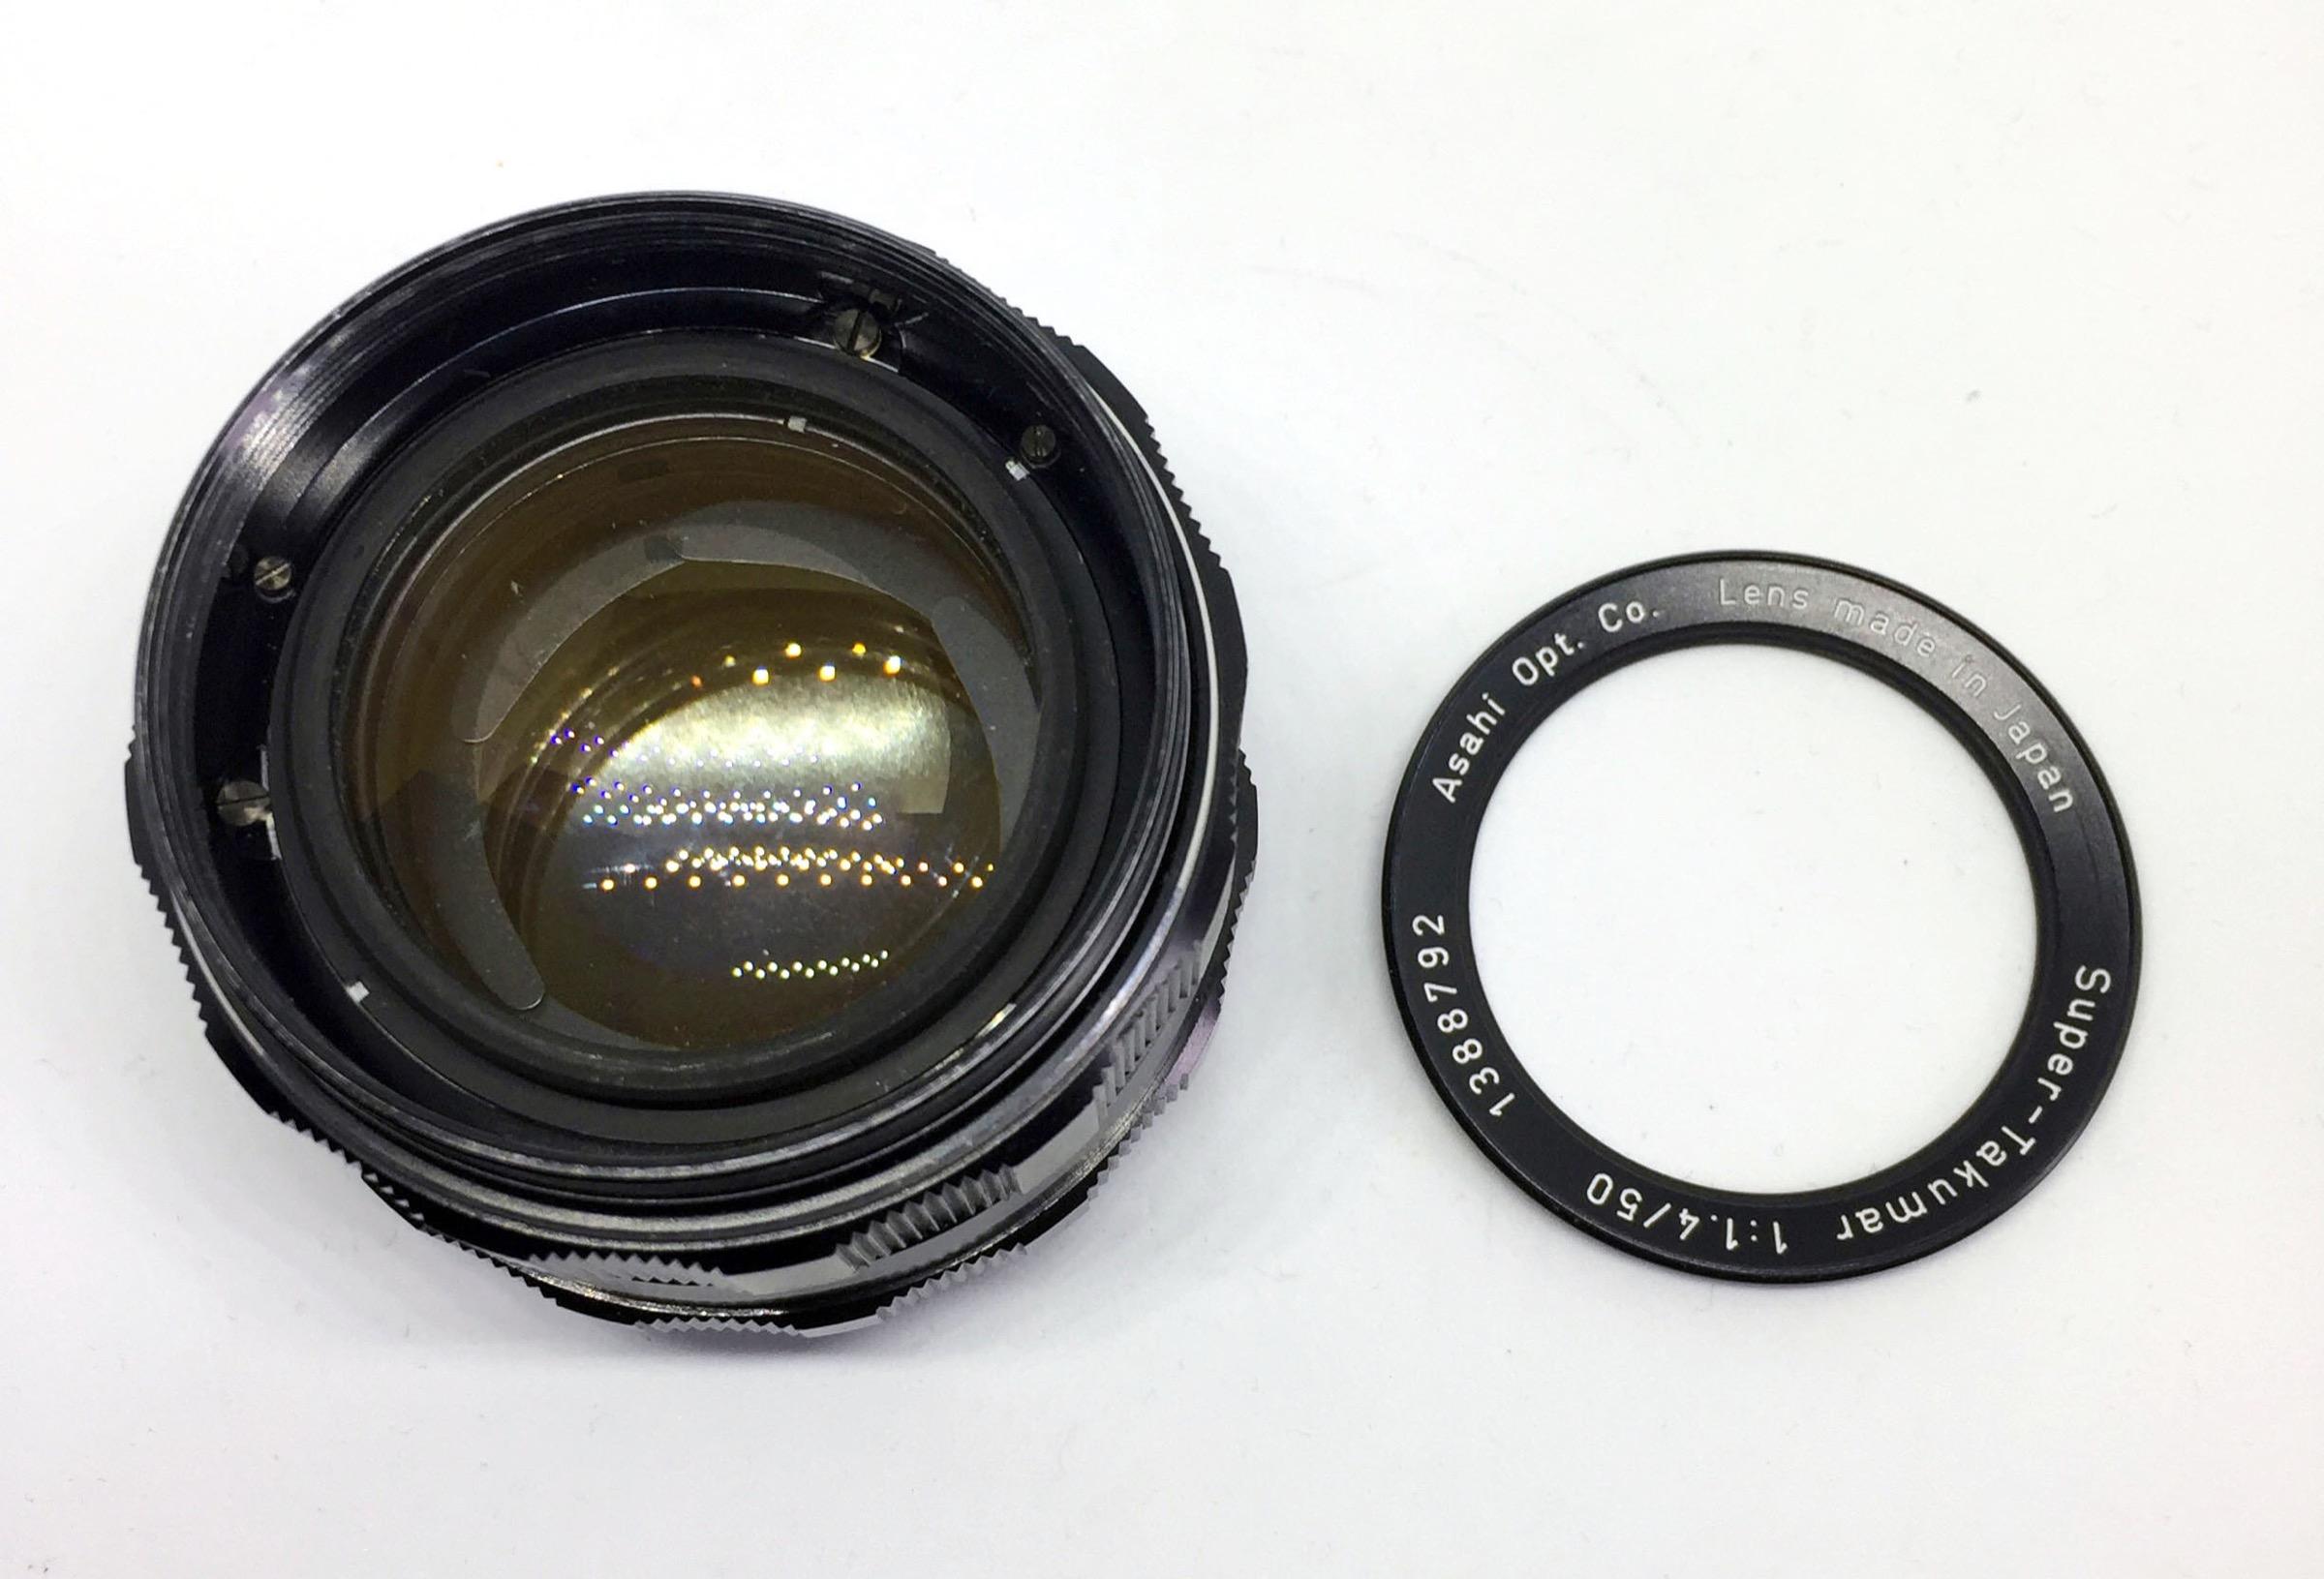 Asahi Pentax Super Takumar 50mm f1 4 Lens Review